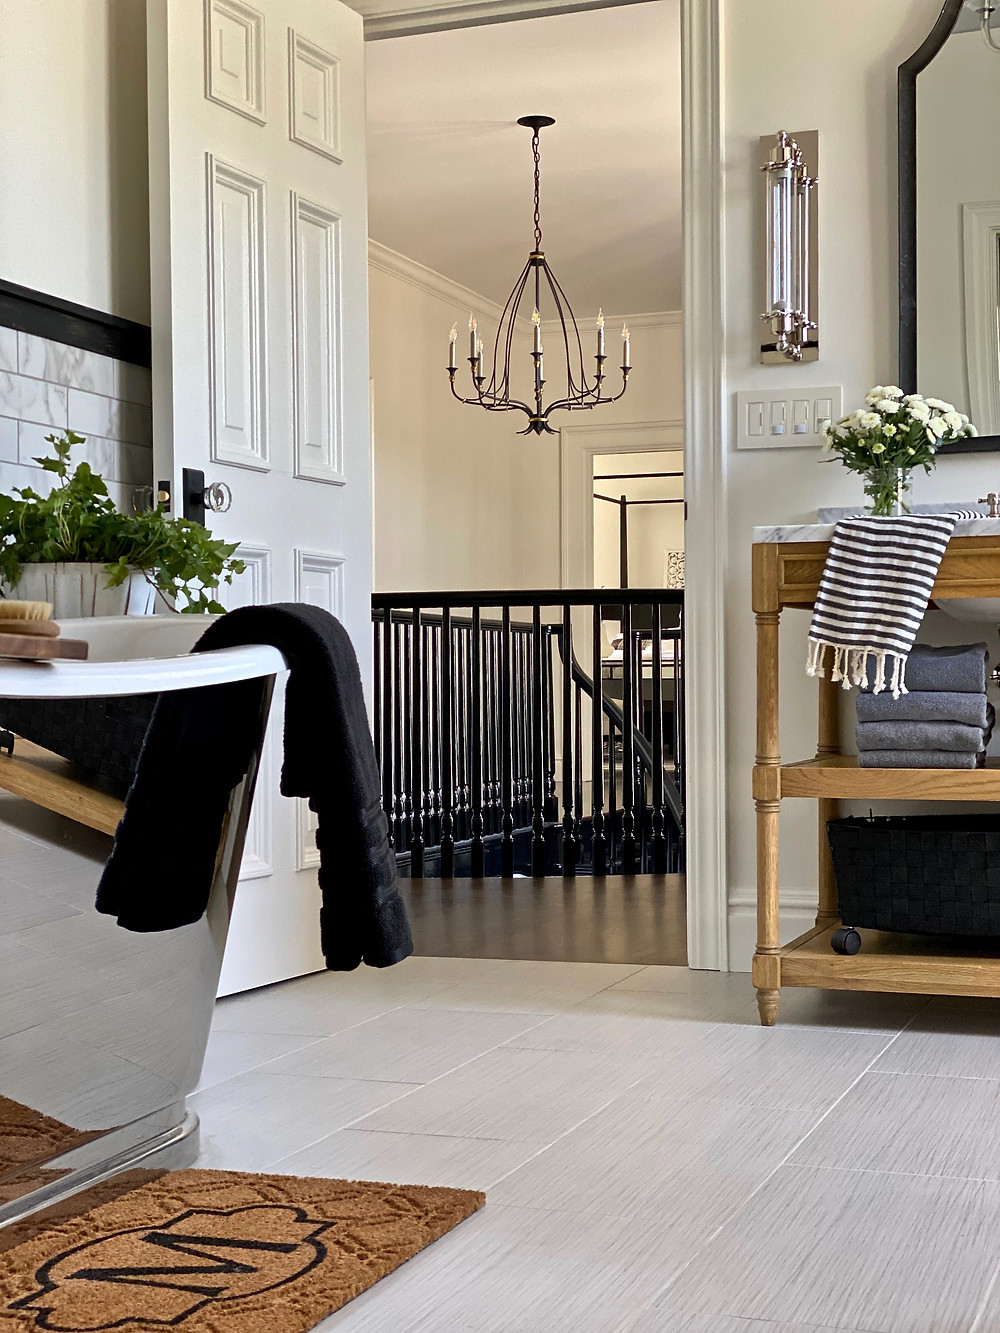 Spa bathroom, black staircase railings, stainless steel tub, spa retreat, bathroom design, black and white bathrooms, beautiful bathroos